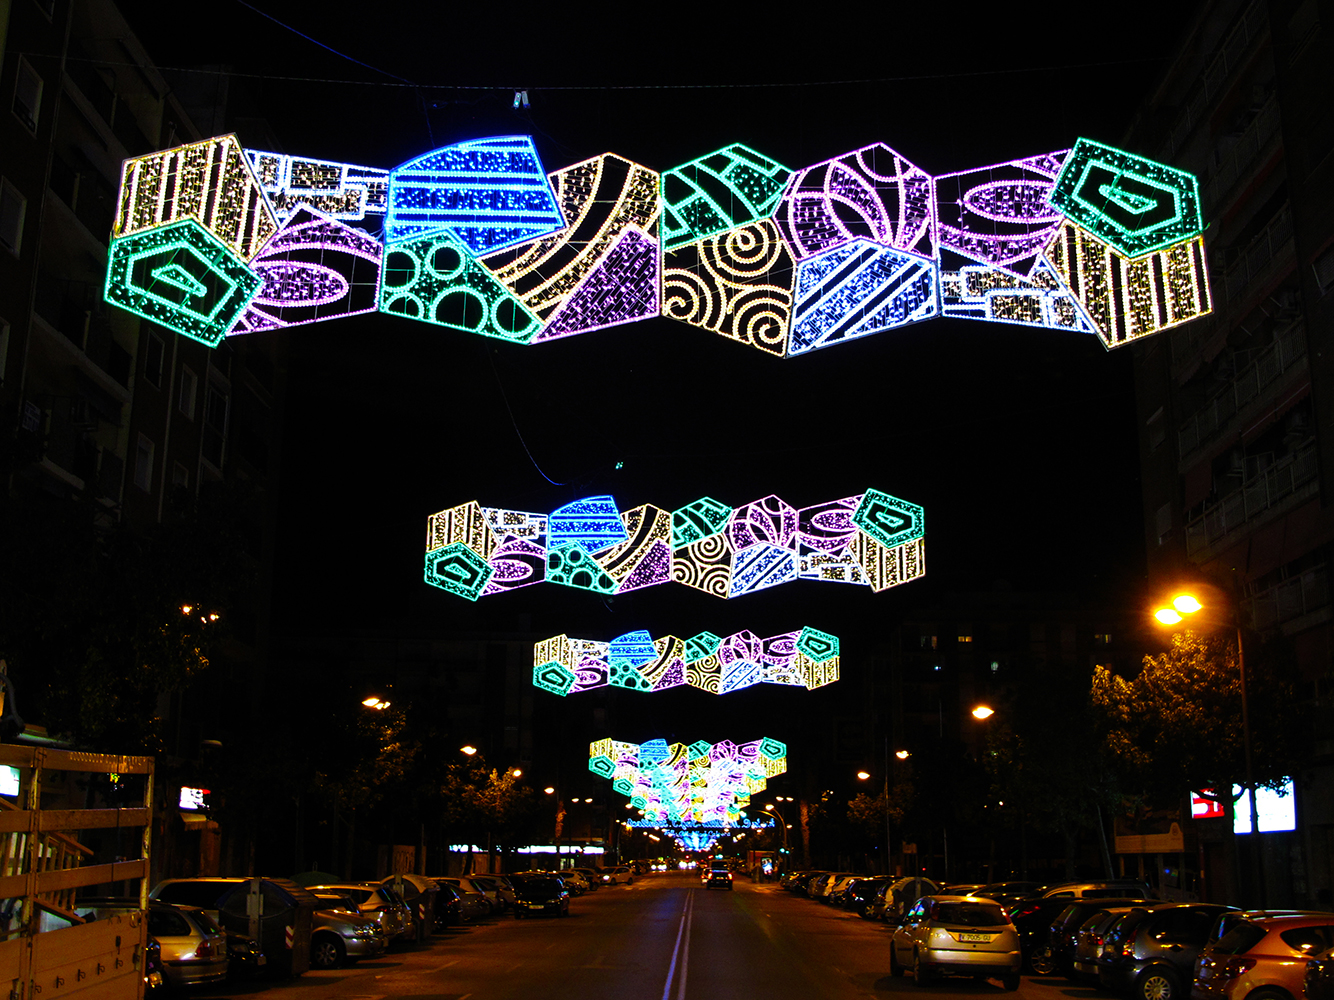 Elecfes Iluminaciones Fiesta 13